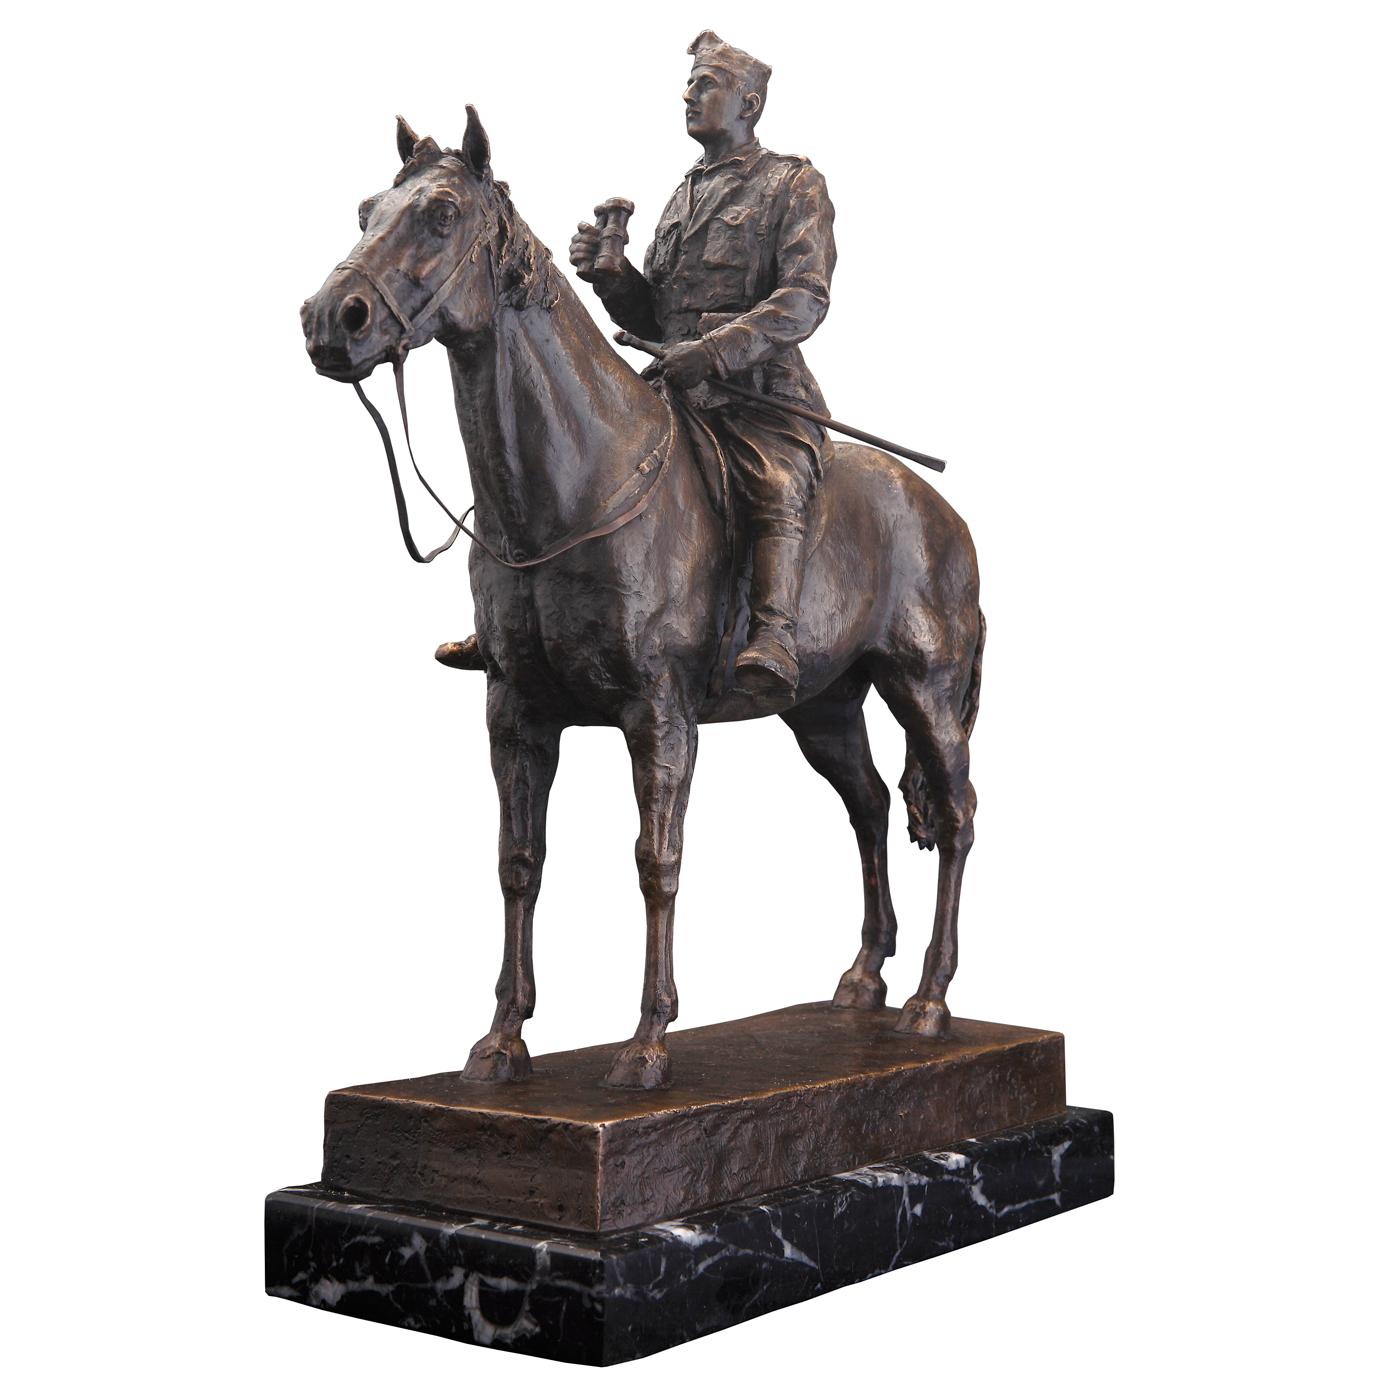 Escultura Francisco Franco África escultura histórica Madrid